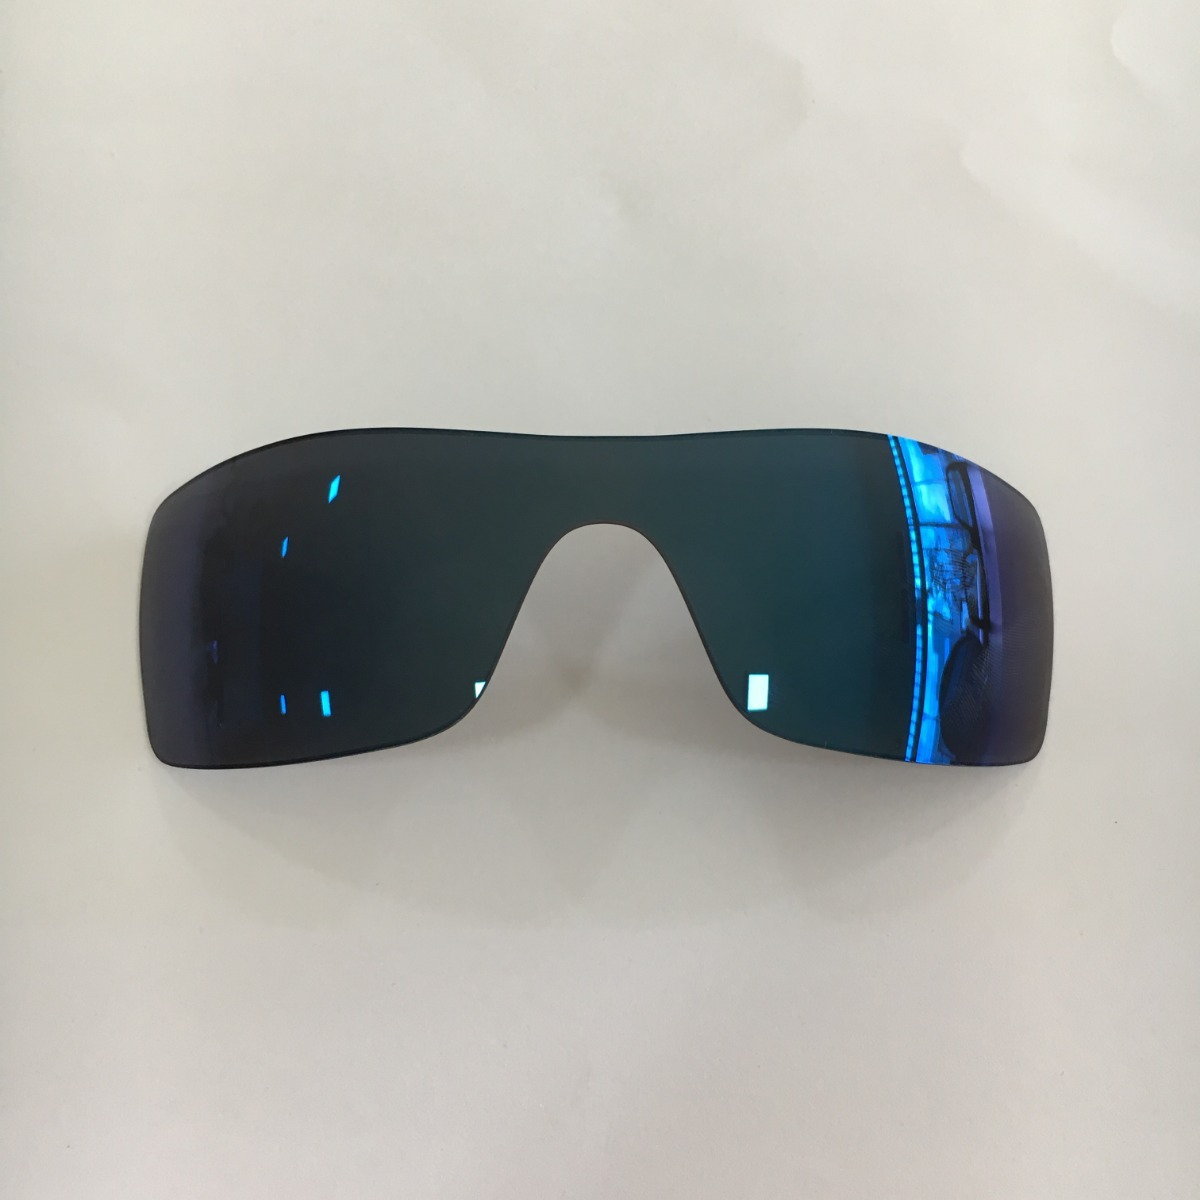 lentes óculos oakley batwolf oo9101 ice iridium - original. Carregando zoom. 9aff1d7a27